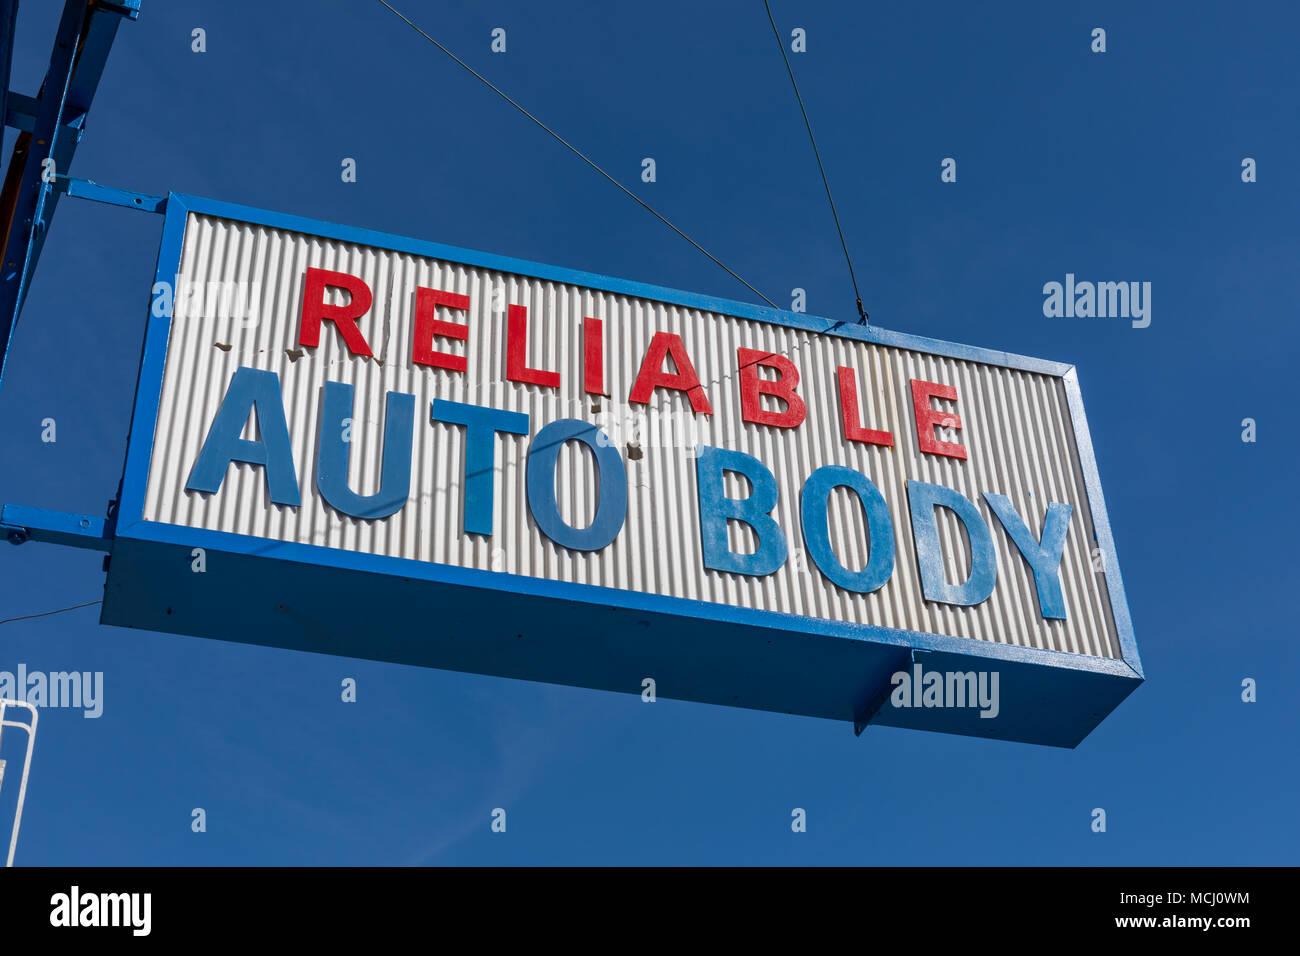 'Reliable Auto Body' sign; San Francisco, California, USA - Stock Image